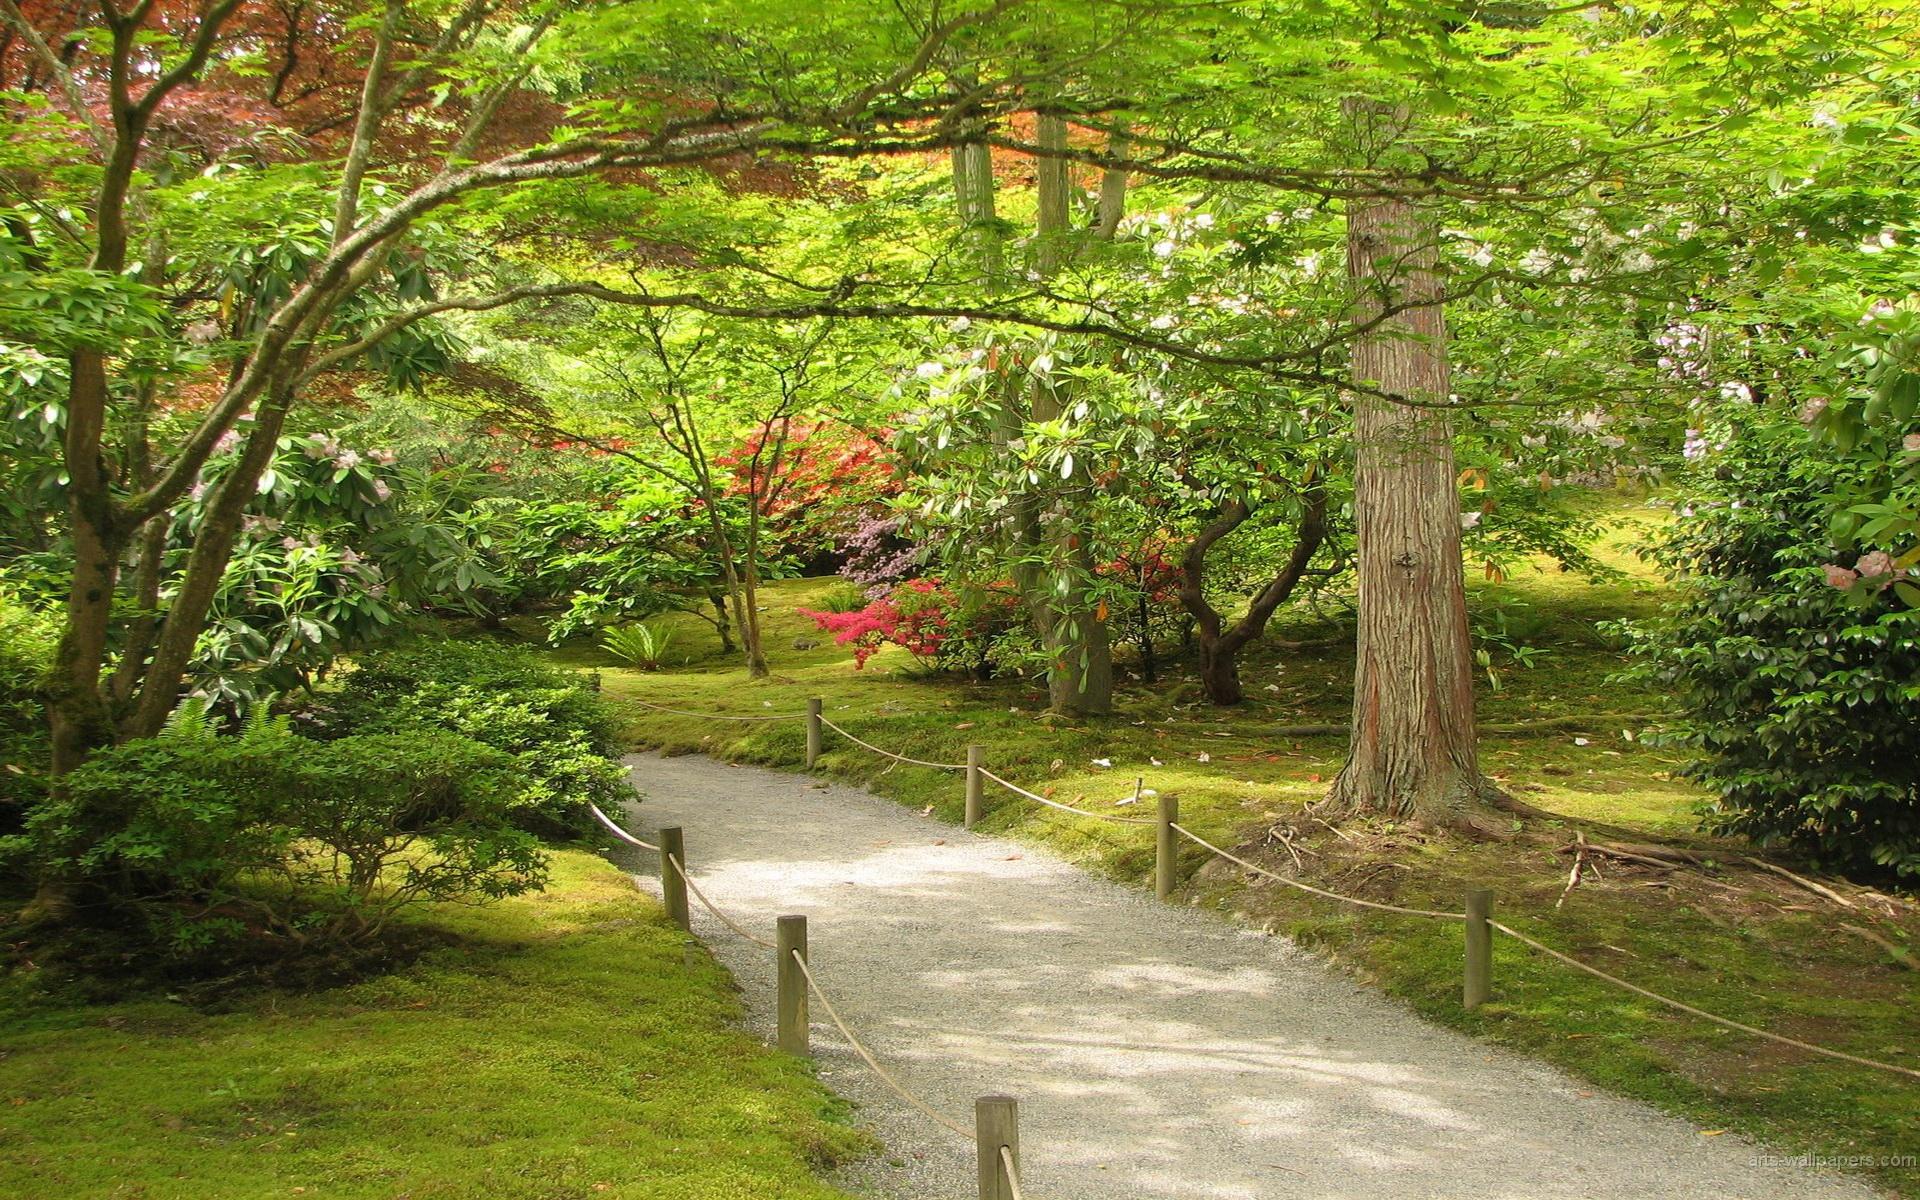 spring japanese garden wallpaperspring japanese garden wallpaper 1 1920x1200